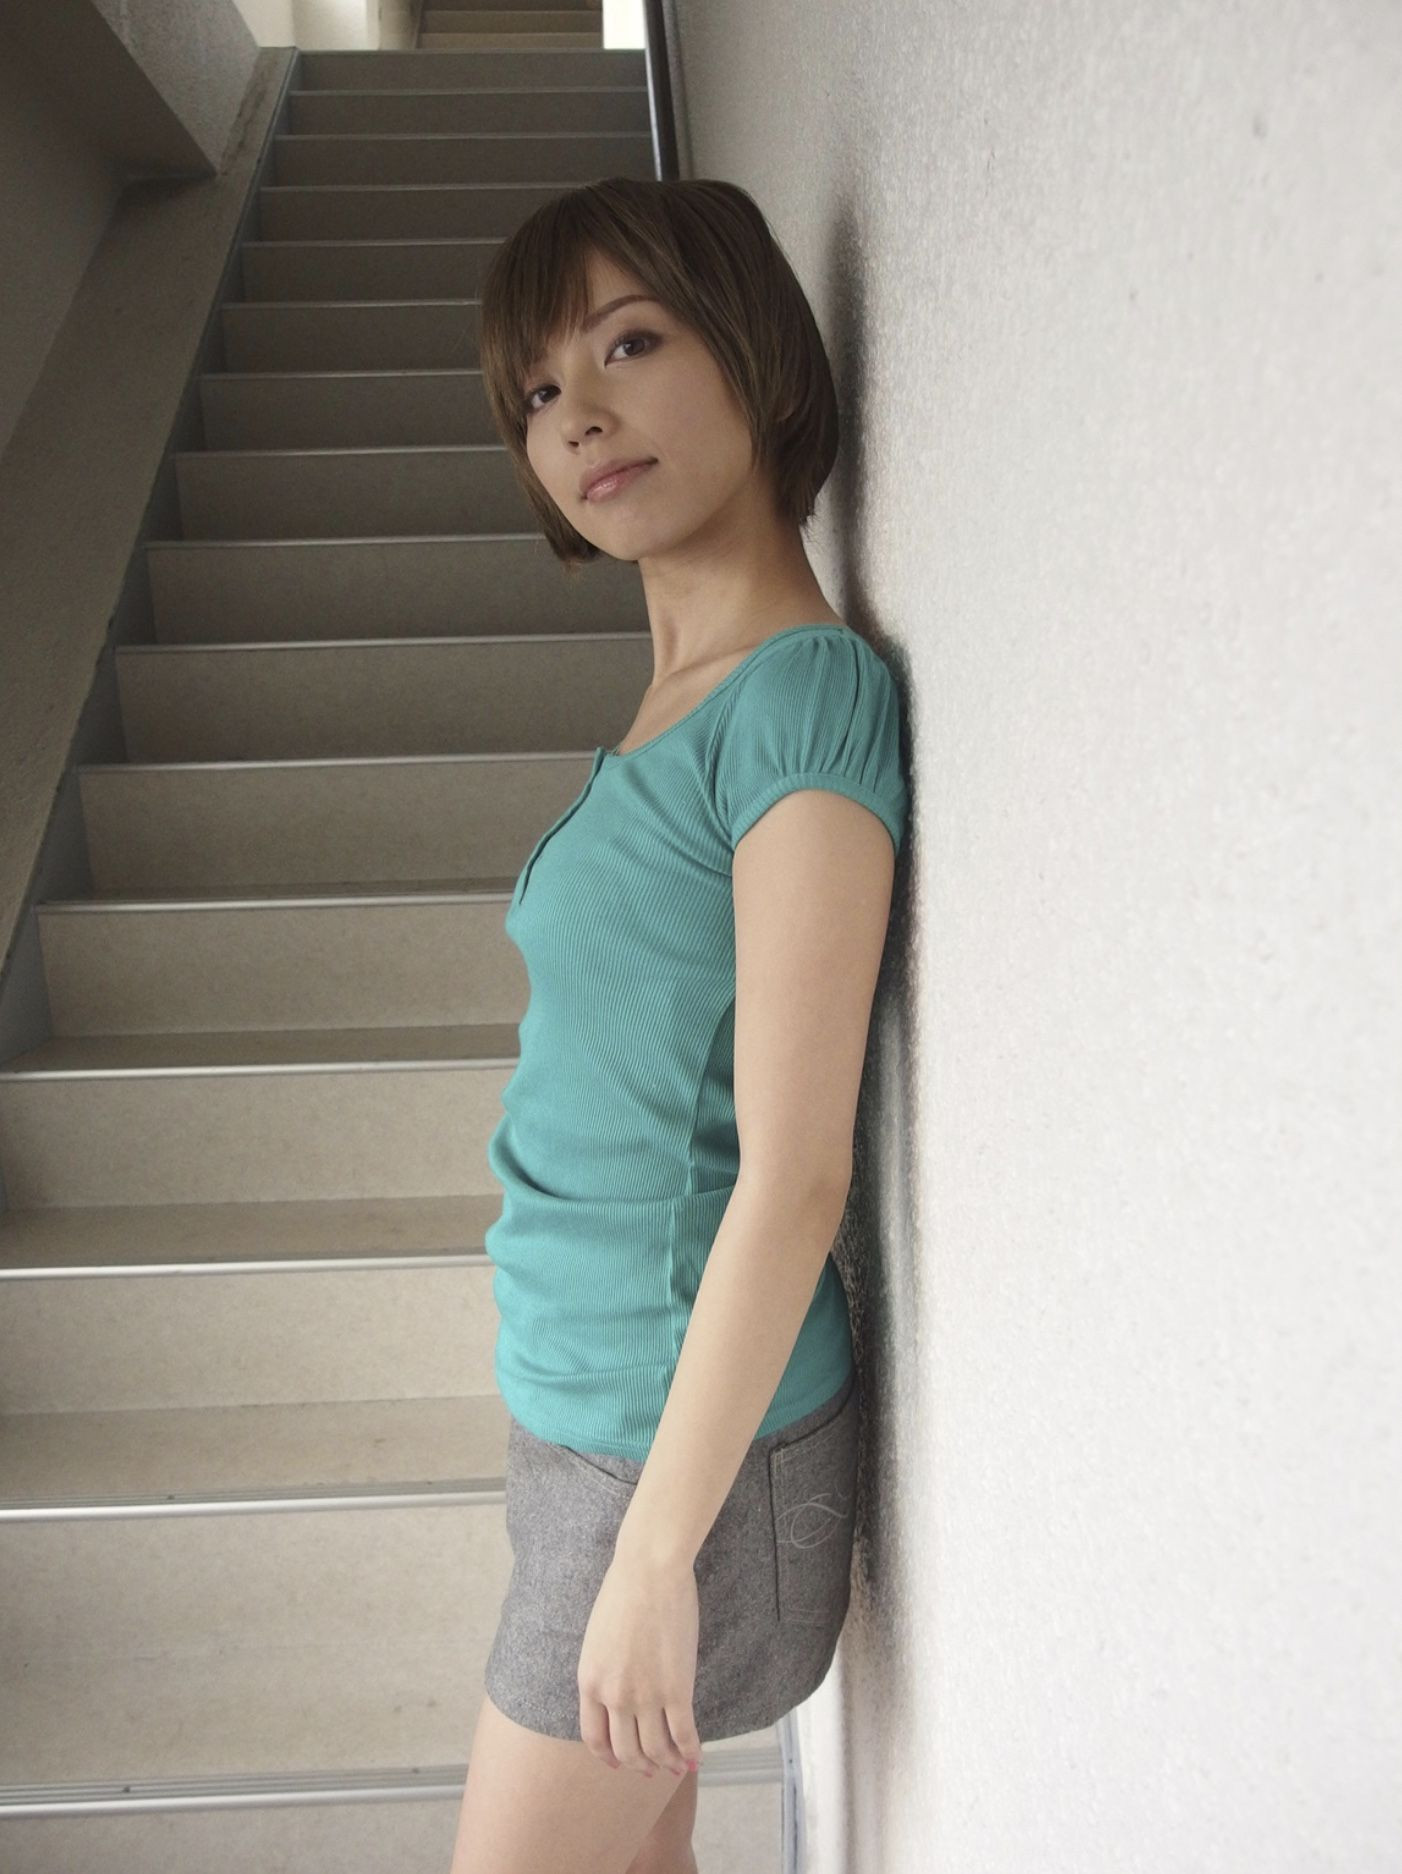 Sweat Beauty 横山美雪 photo 015